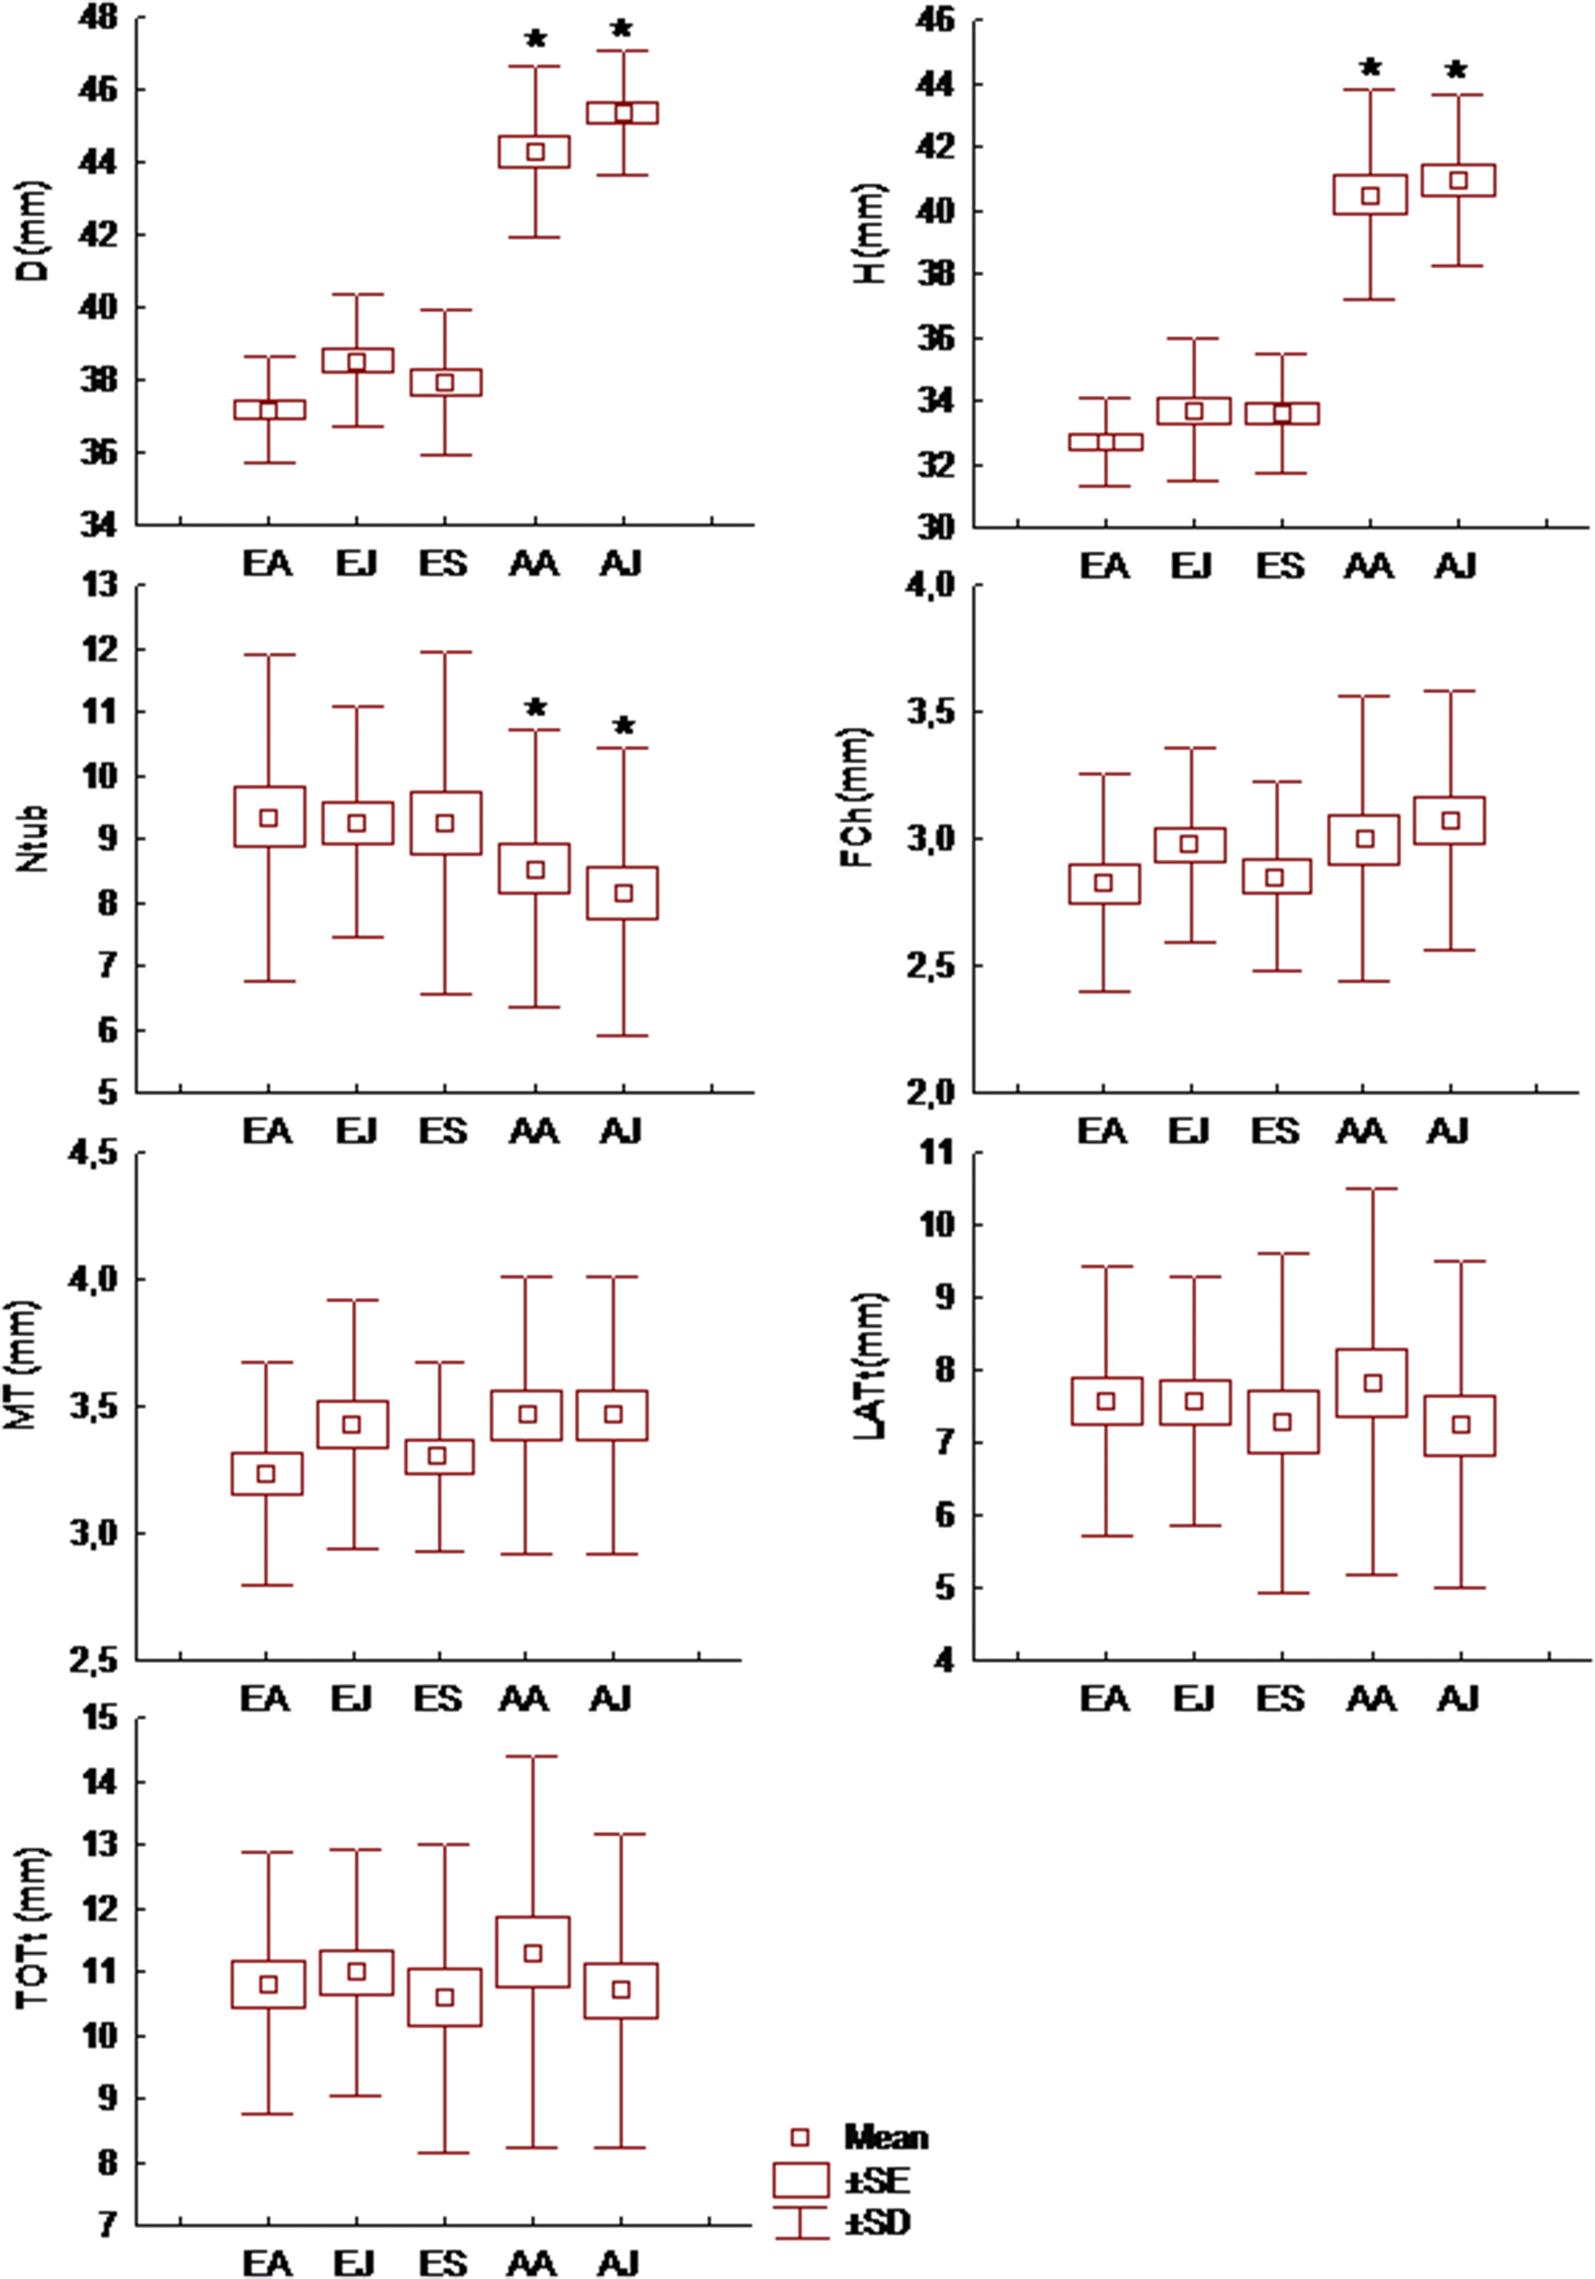 Intraspecific morphological variation of the sperm storing